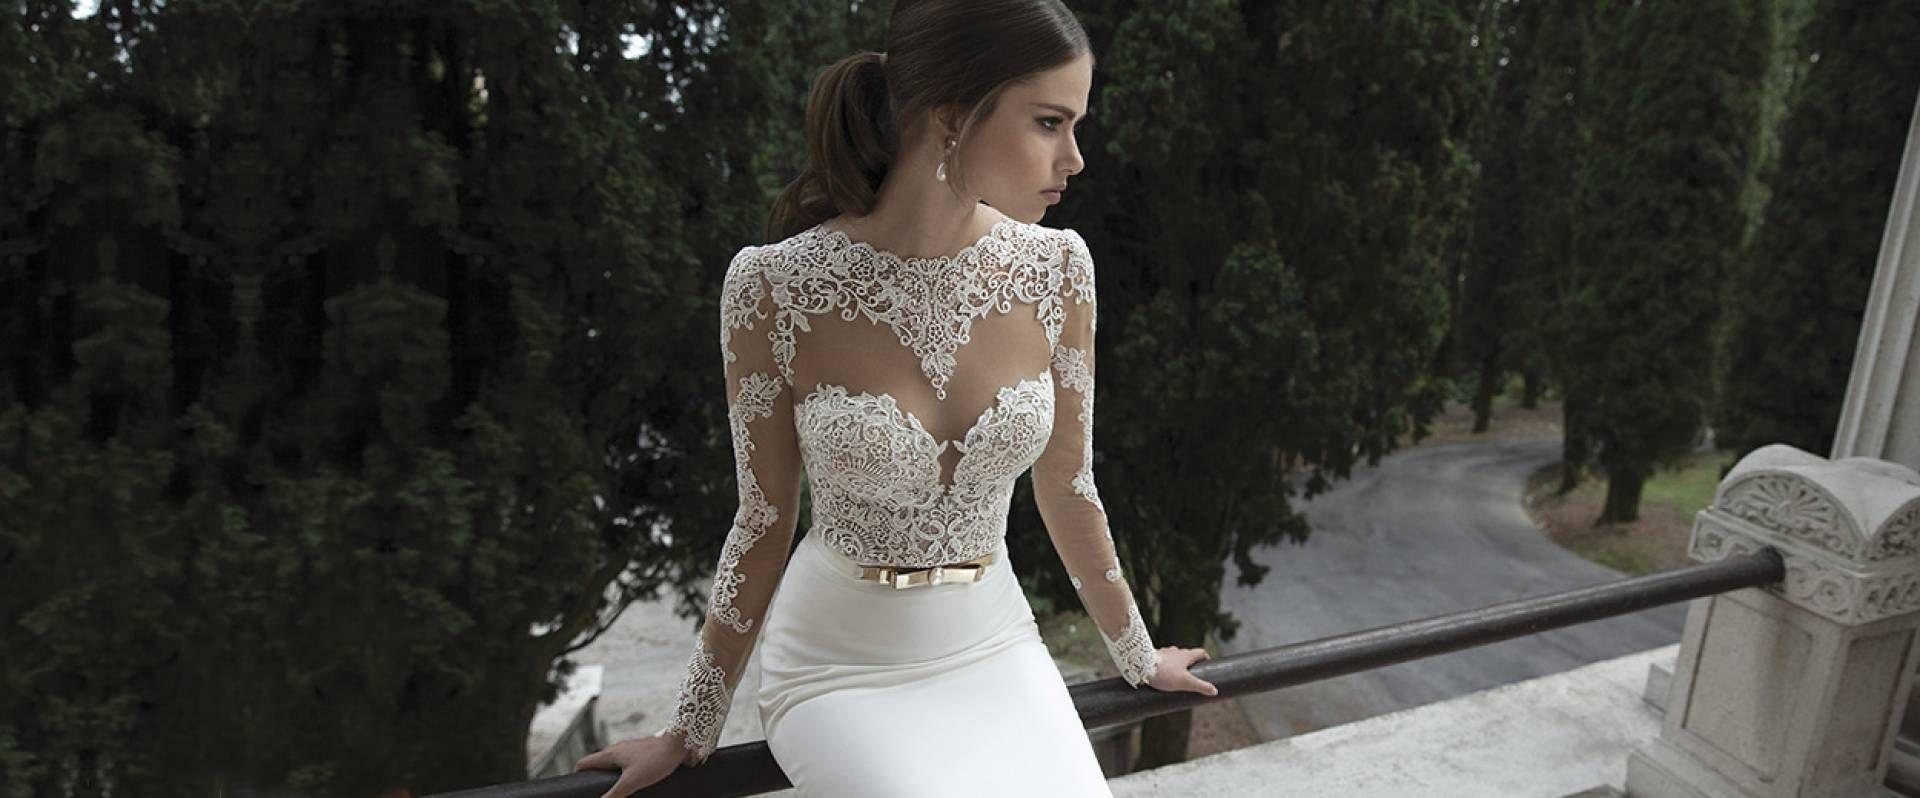 Anjolique Bridal Formal Wedding Dress Inspiration Bow Wedding